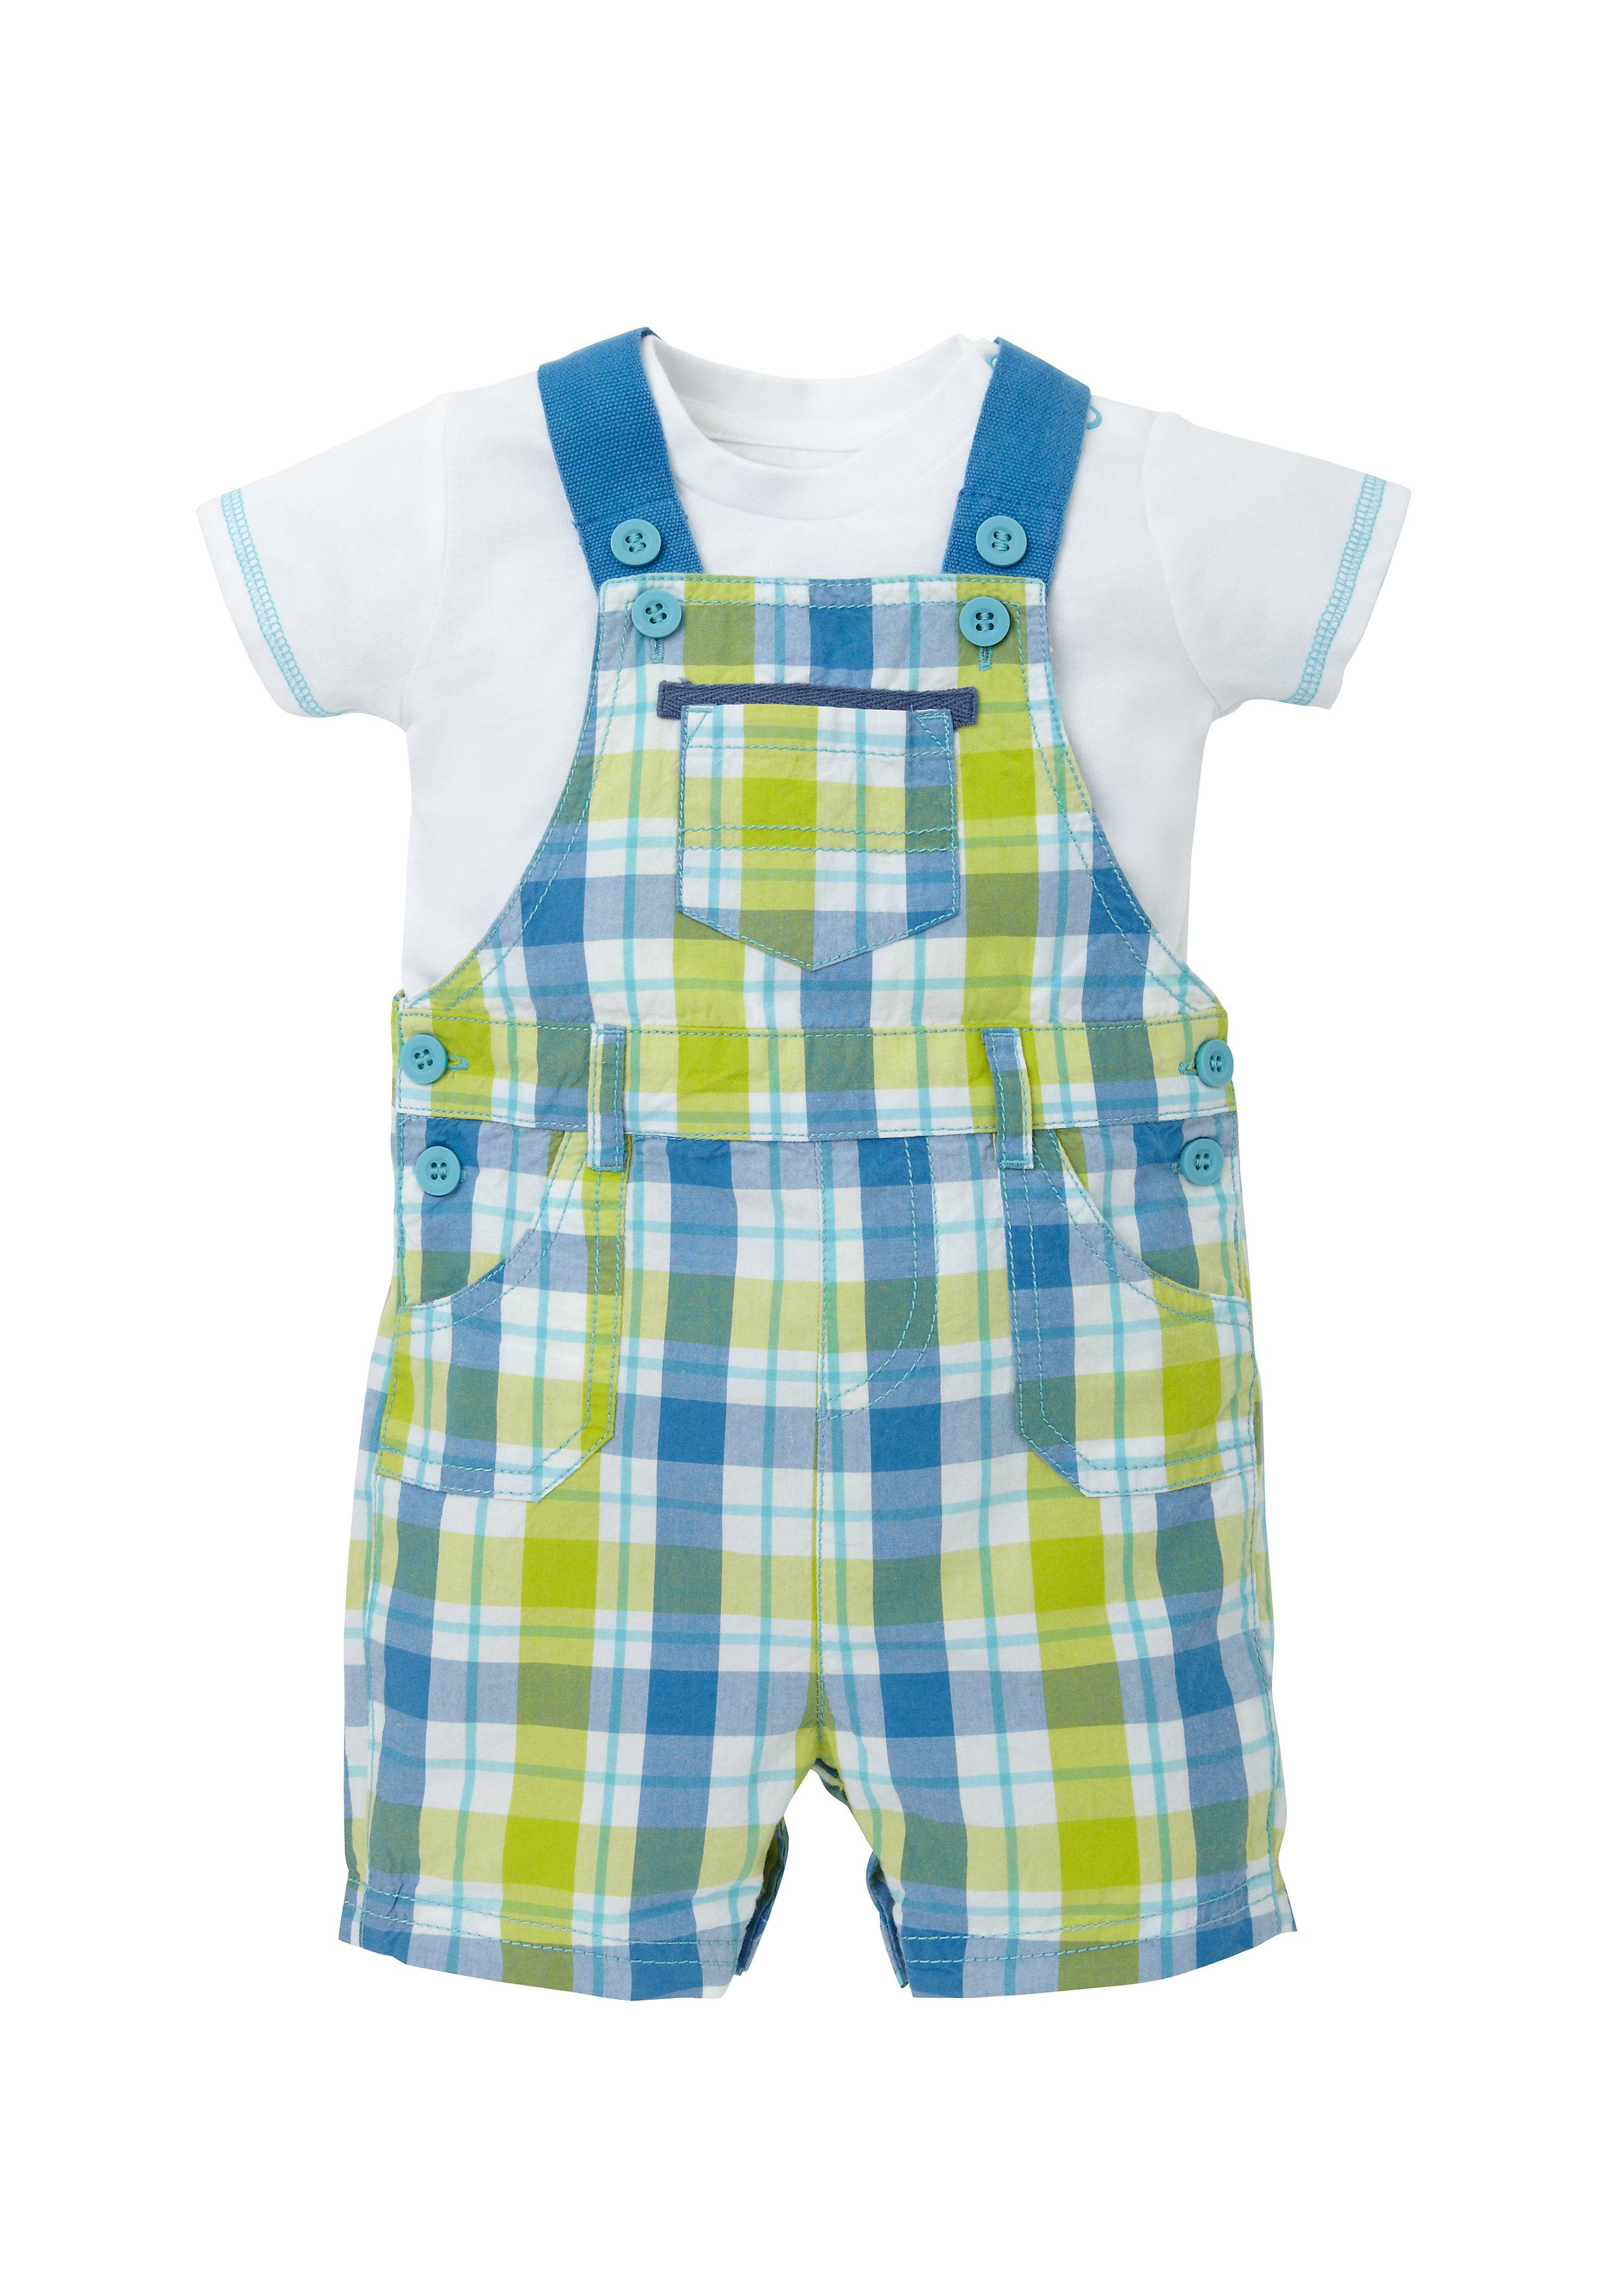 Mothercare | Boys Half Sleeves Dungaree Set Checks - Blue